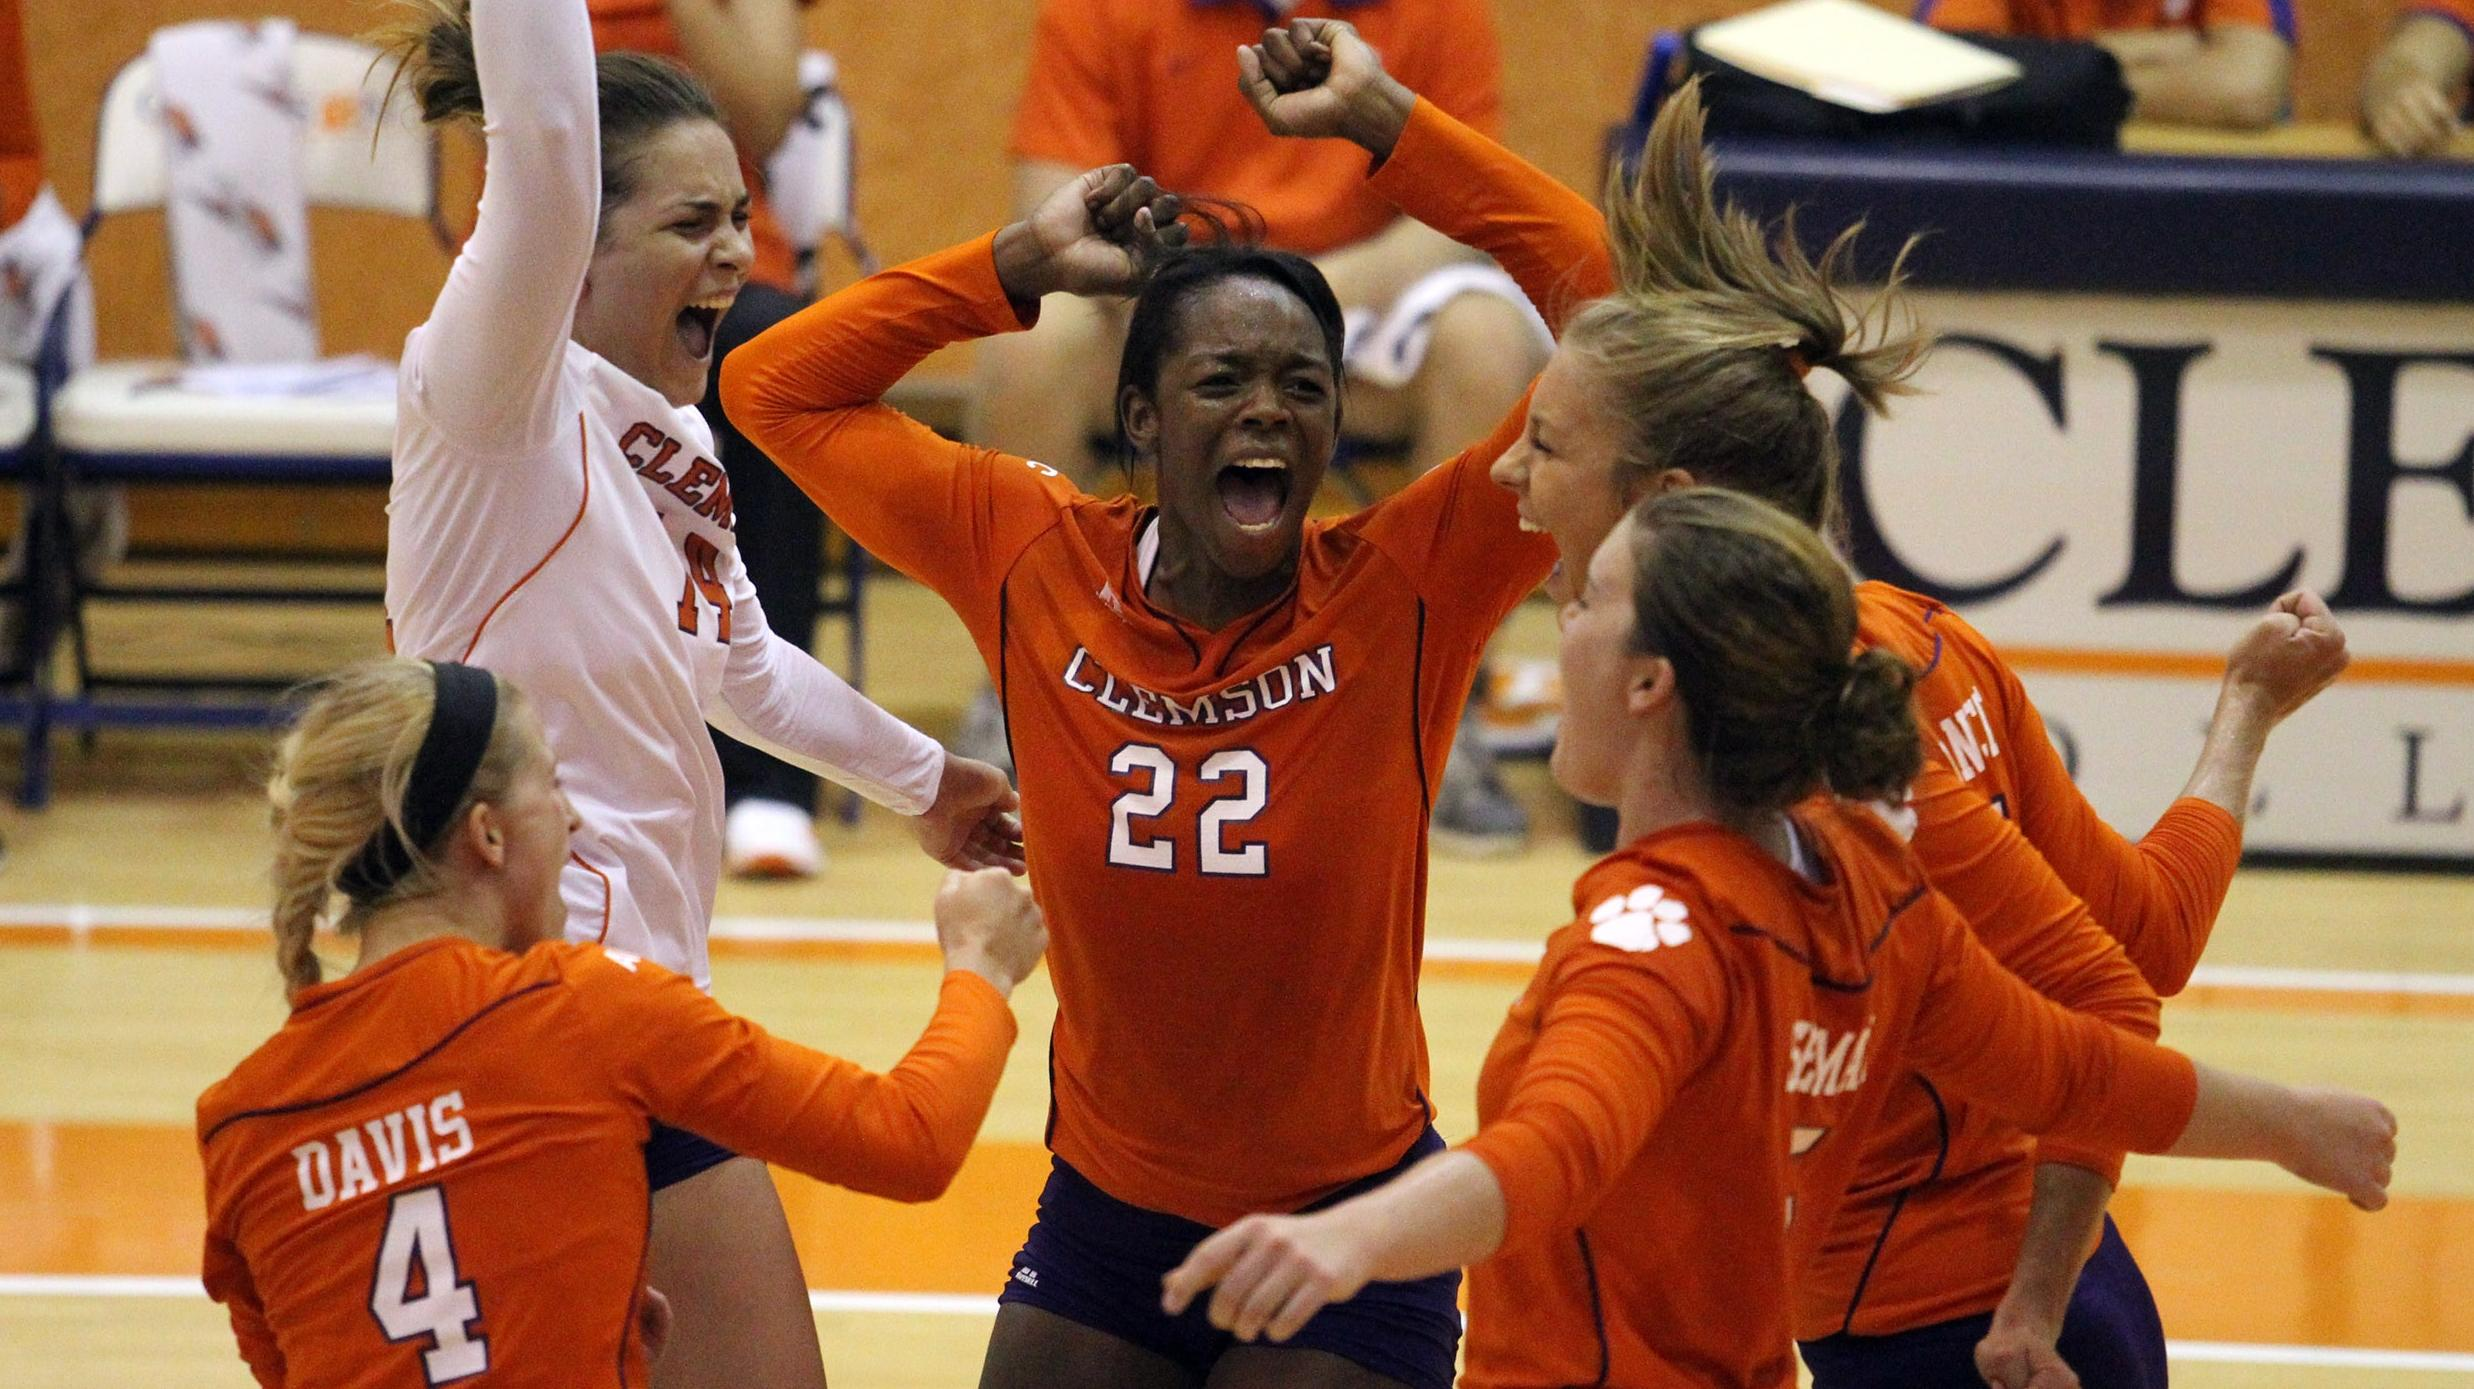 Orange Tops White in Annual Volleyball Scrimmage